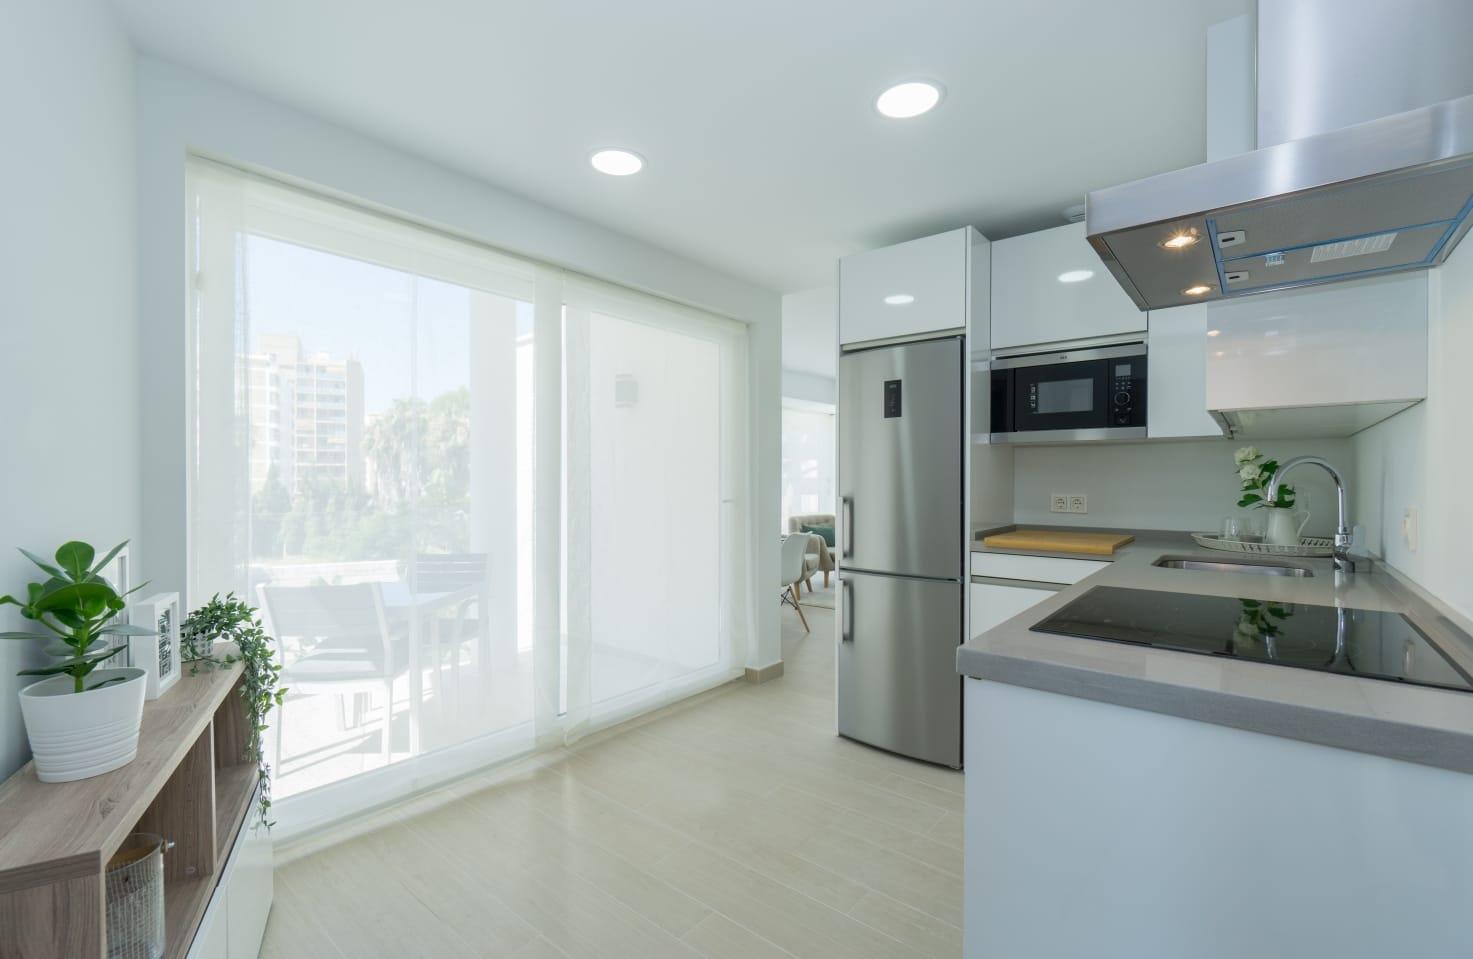 Apartment for sale in Benalmádena Costa